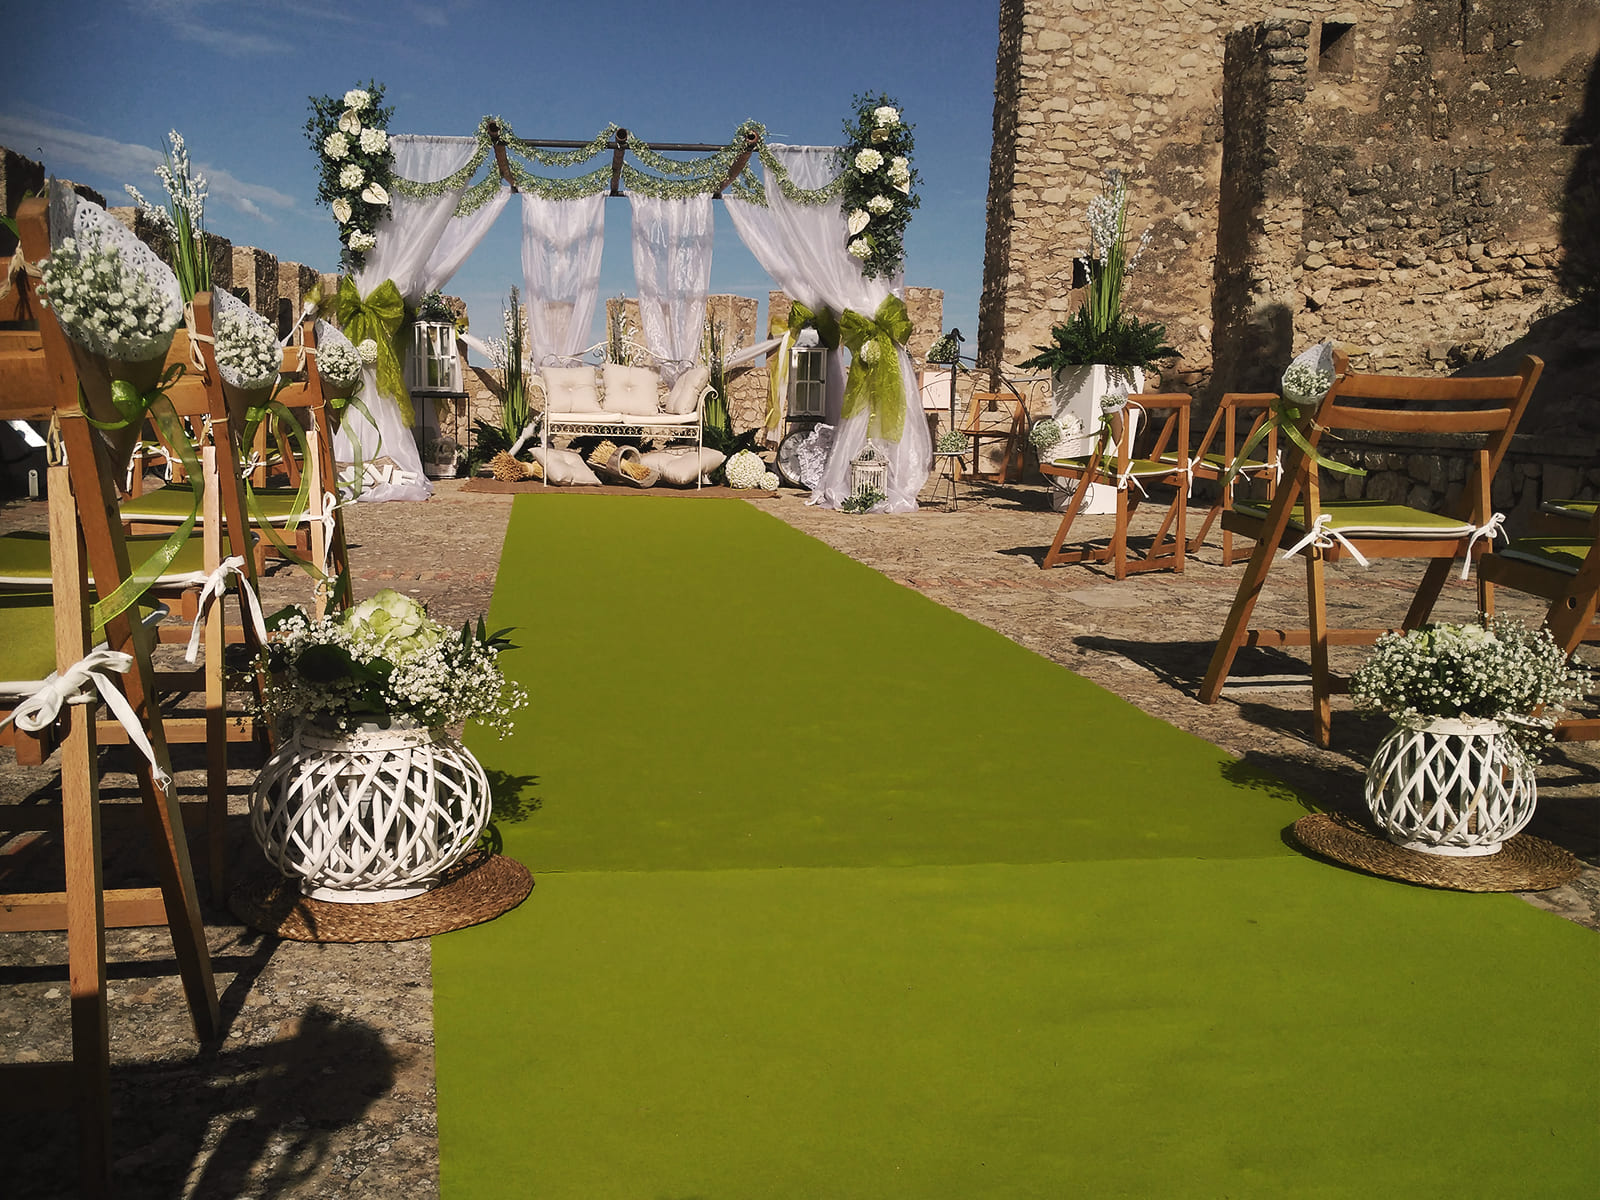 boda-civil-castillo-verde-MS-05_HIDROJARDIN-Bañeres